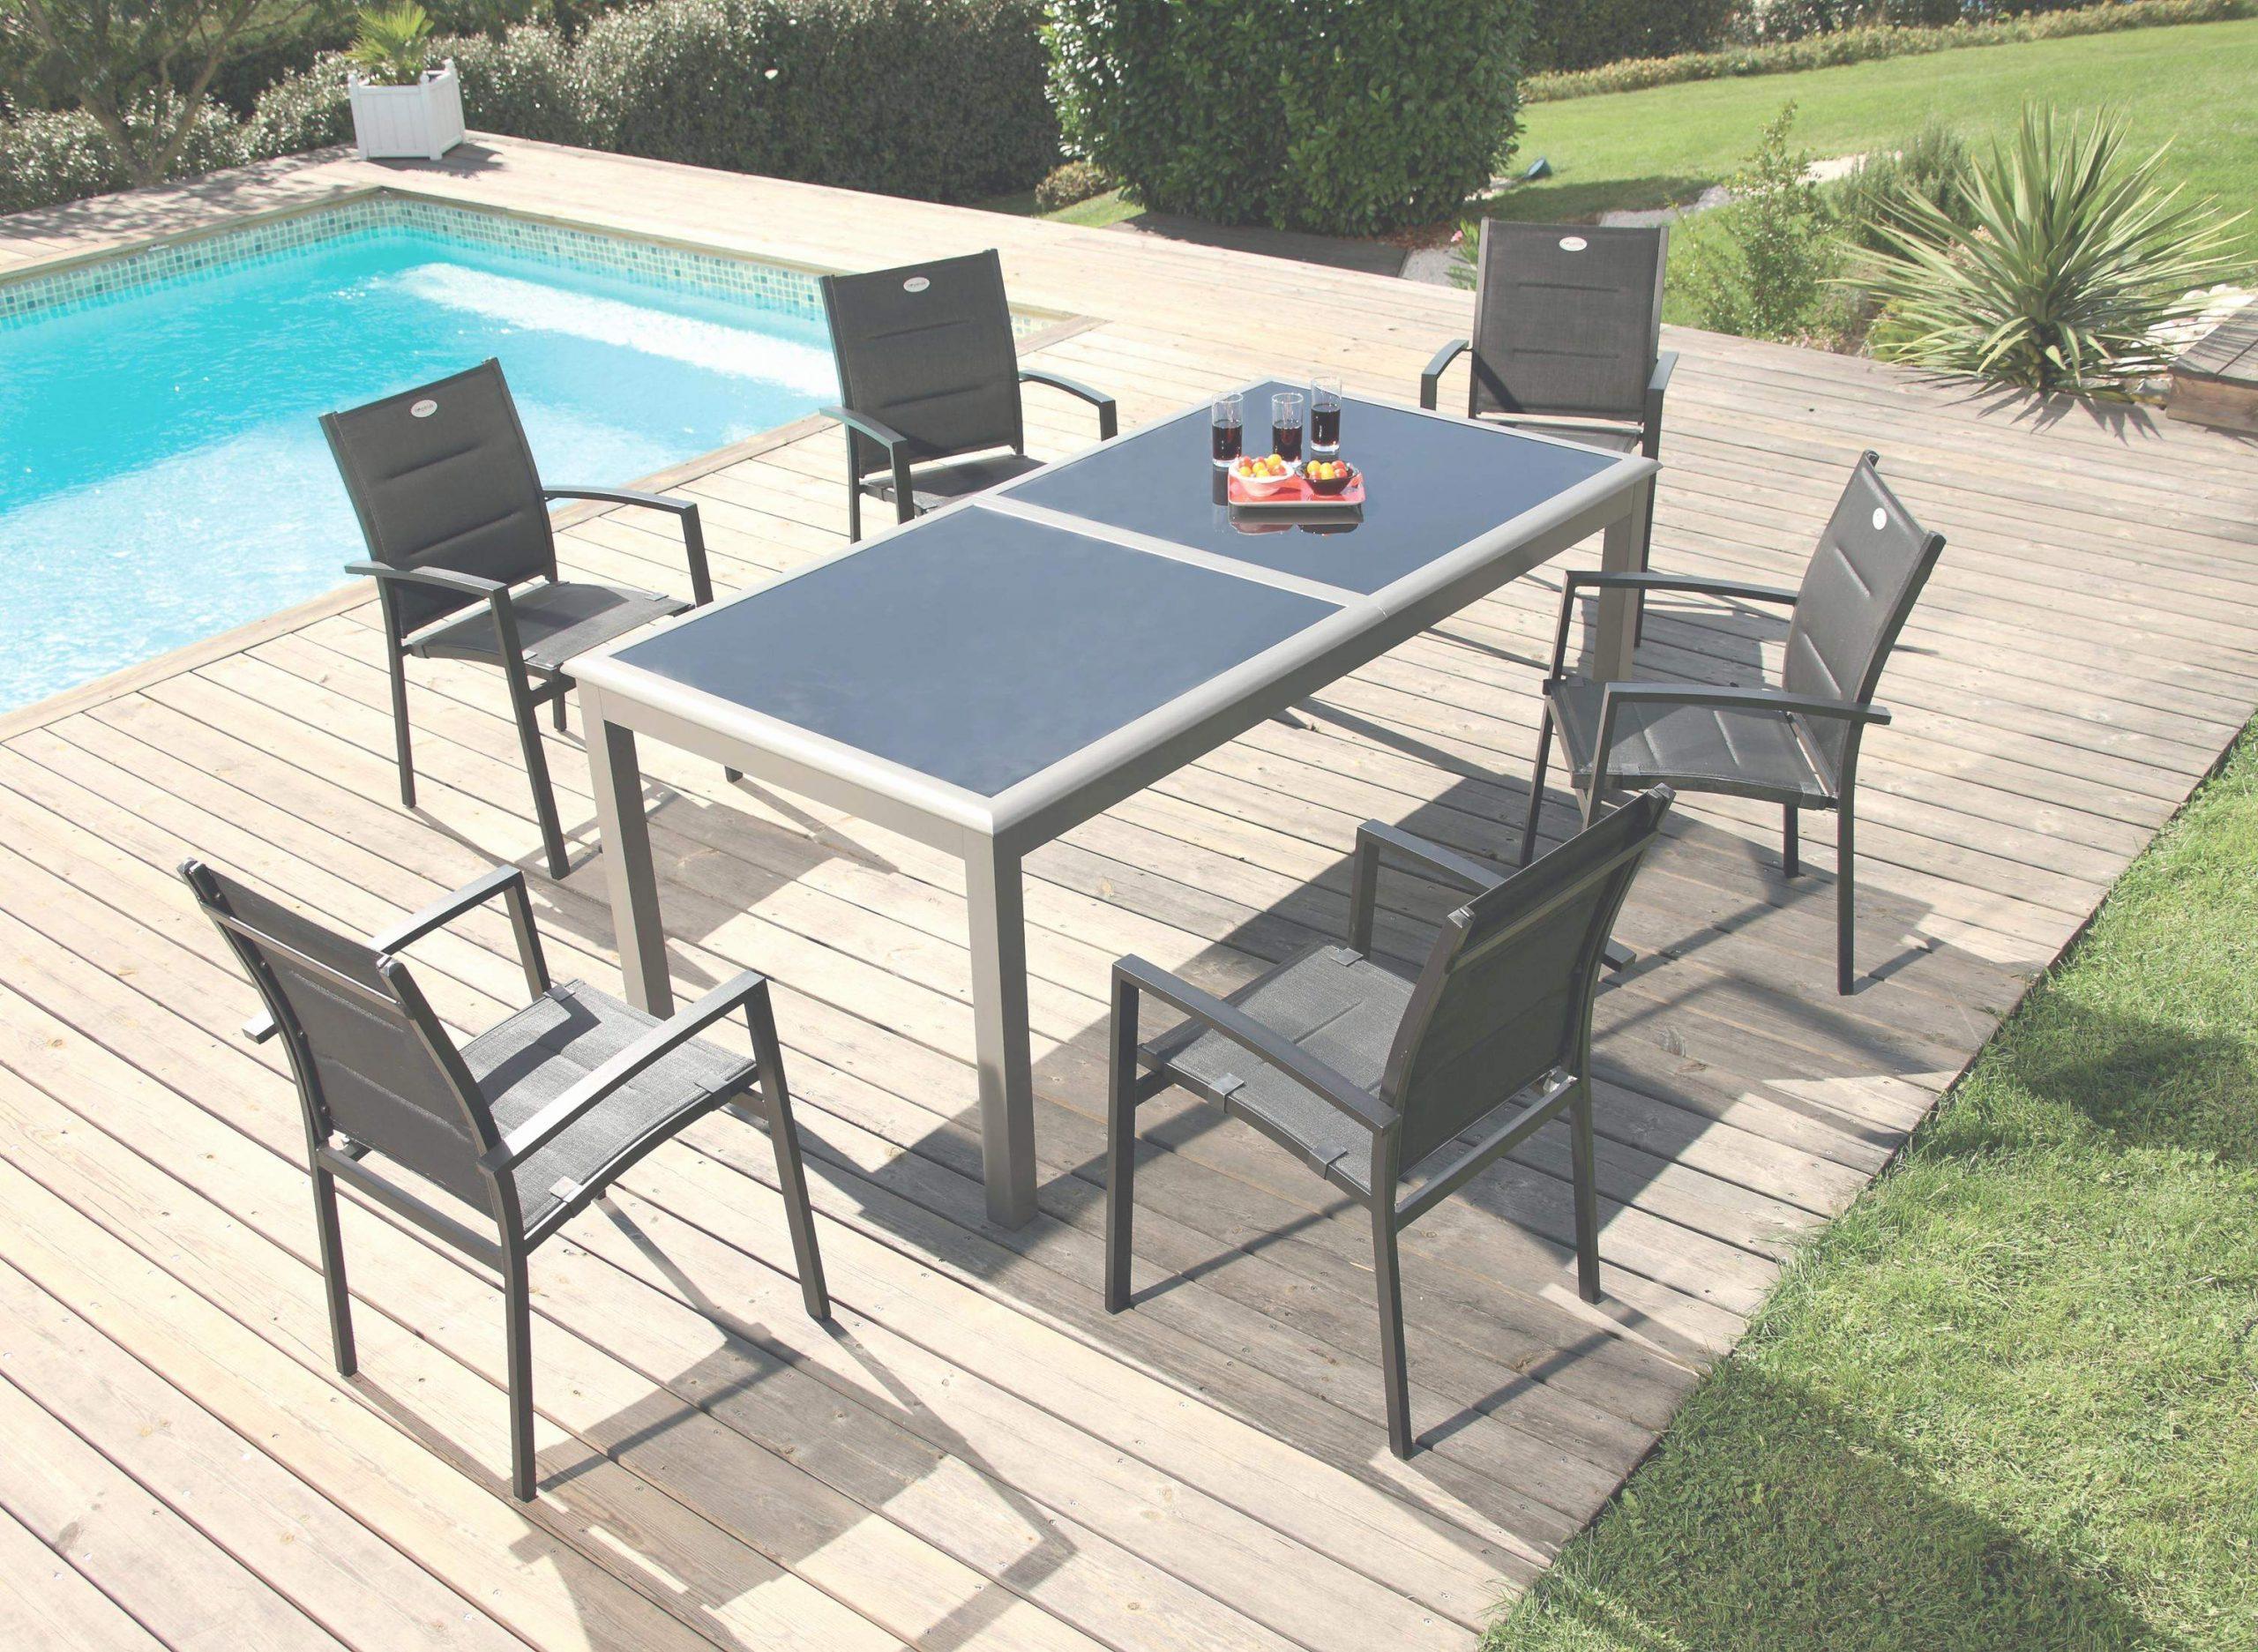 Chaise Centrakor De Jardin Home Brillant Table Pliante ... concernant Centrakor Salon De Jardin